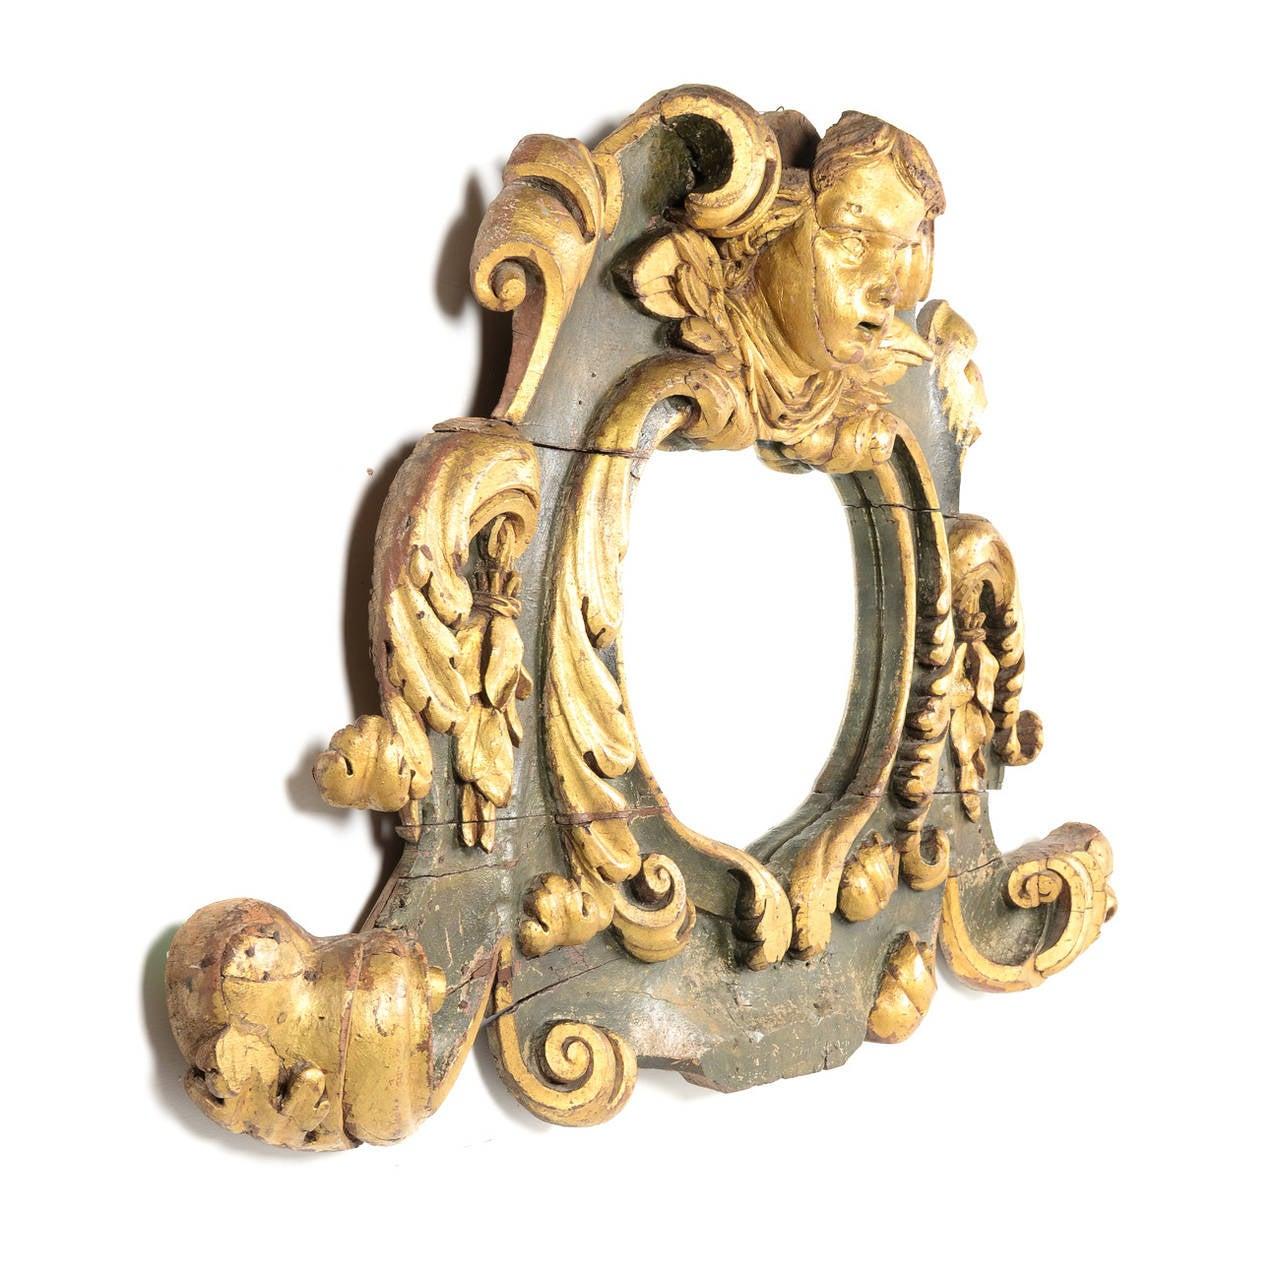 Italian baroque mirror circa 1700 for sale at 1stdibs for Baroque mirror canada